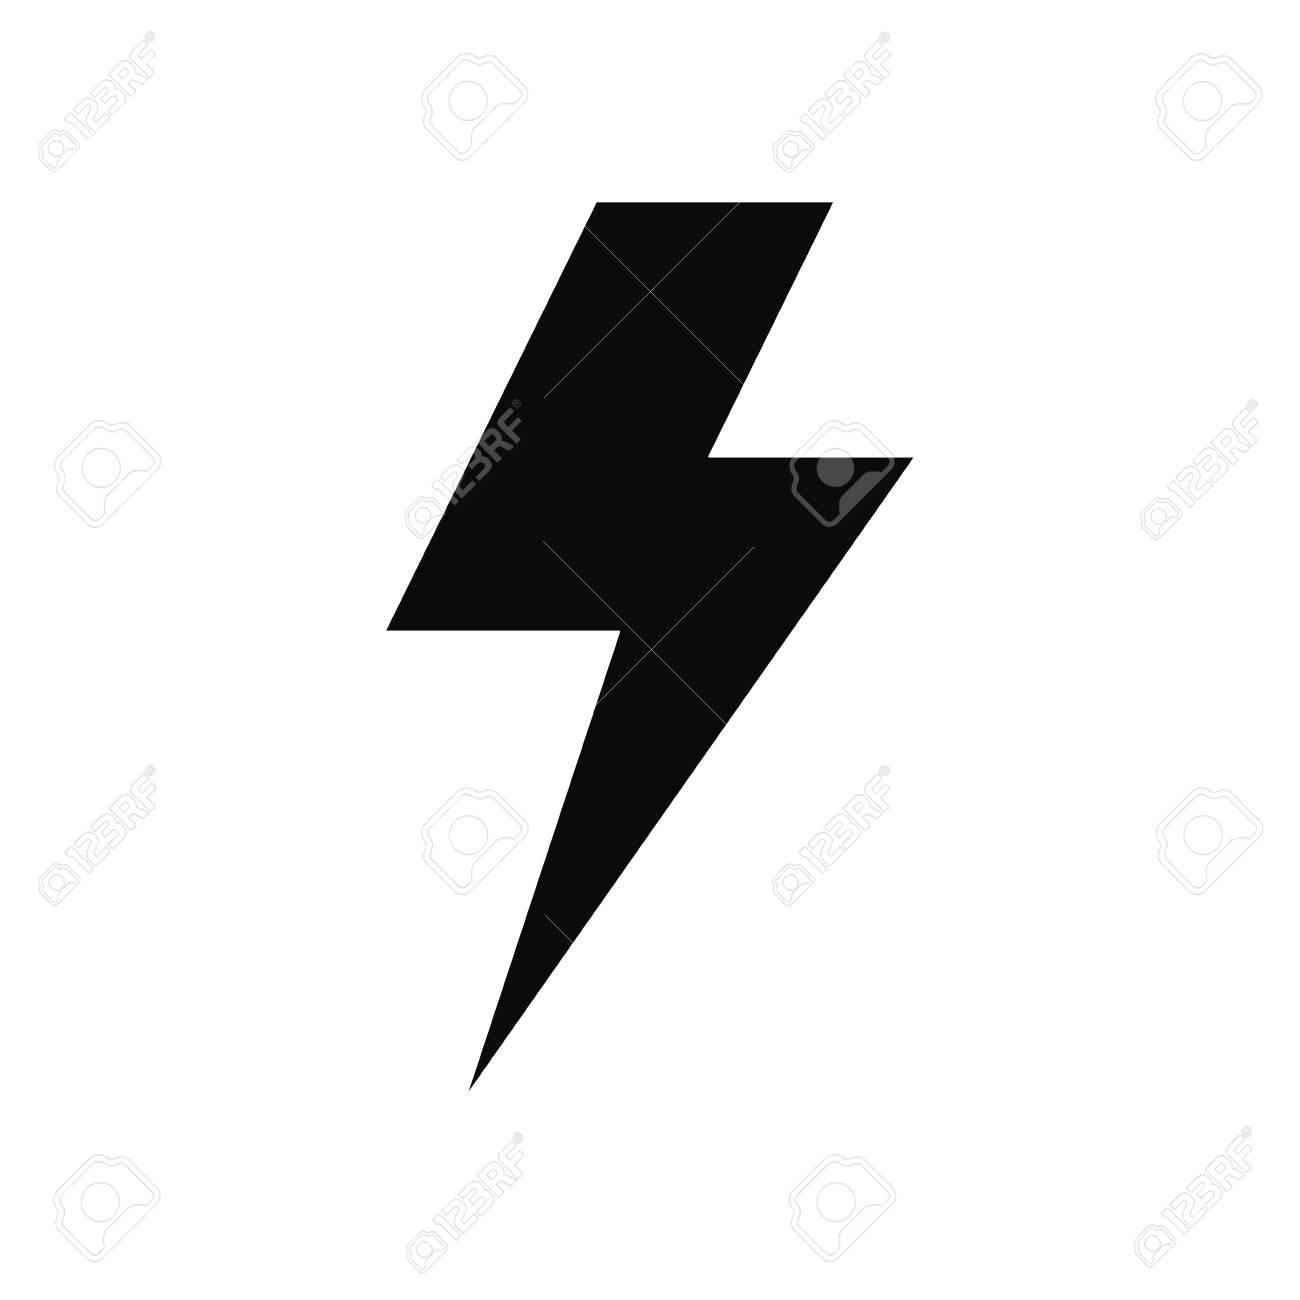 Ray electricity symbol icon vector illustration graphic design